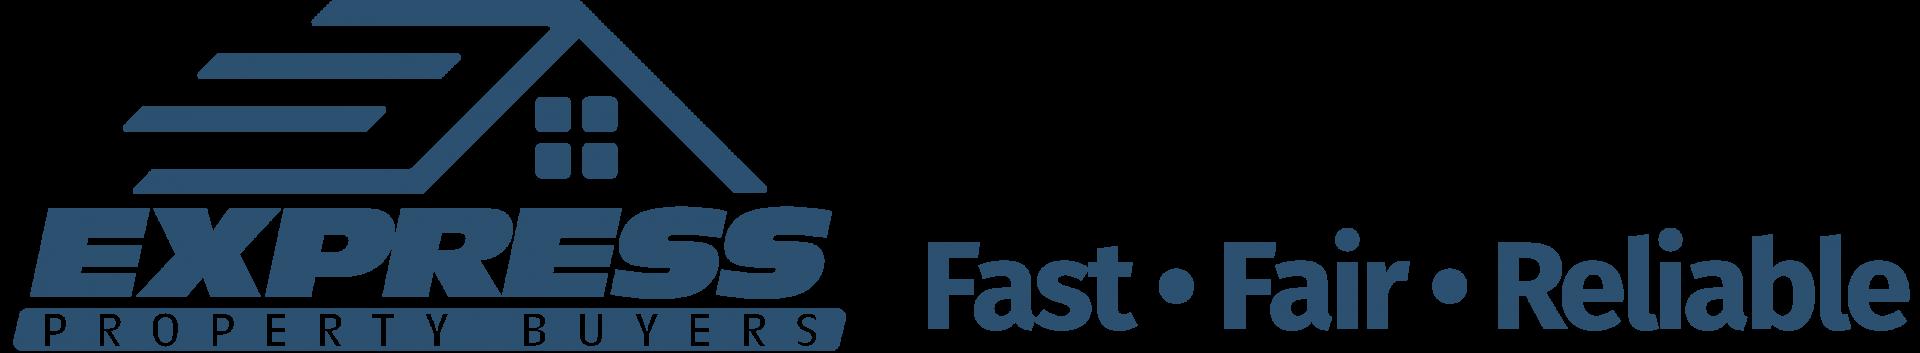 Express Property Buyers logo